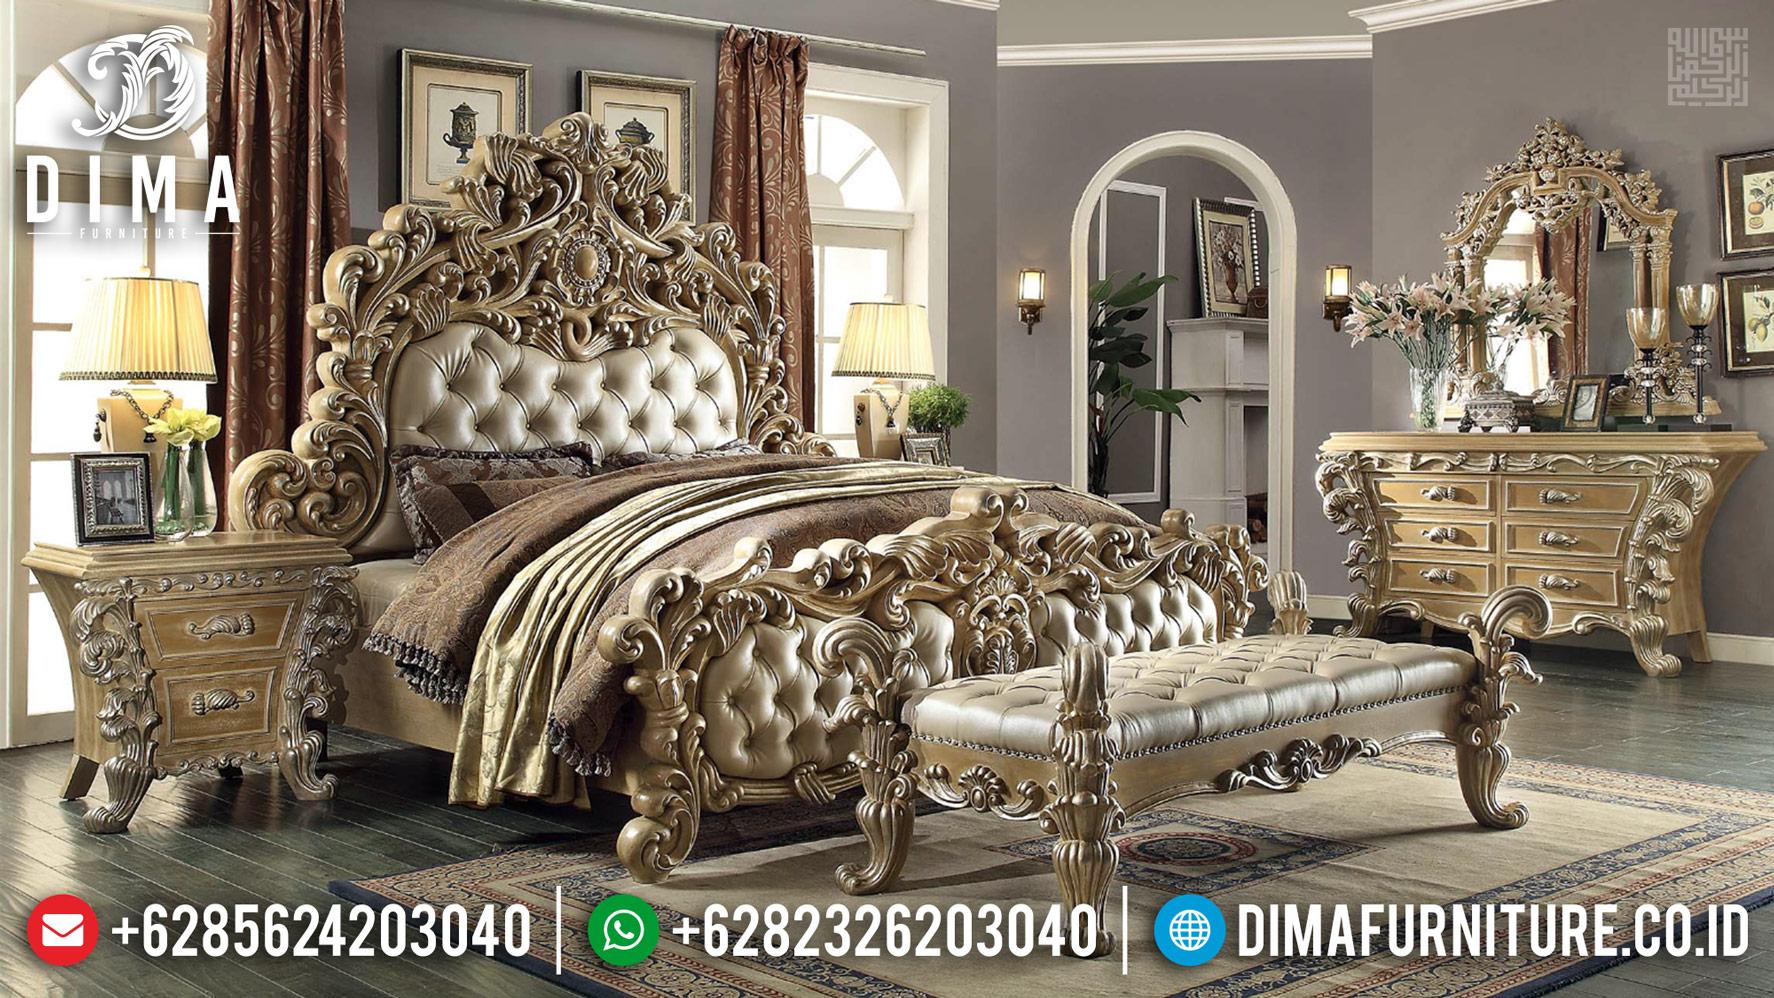 New Item Kamar Set Mewah Ukiran Classic Luxury Royal Furniture Jepara MMJ-0436